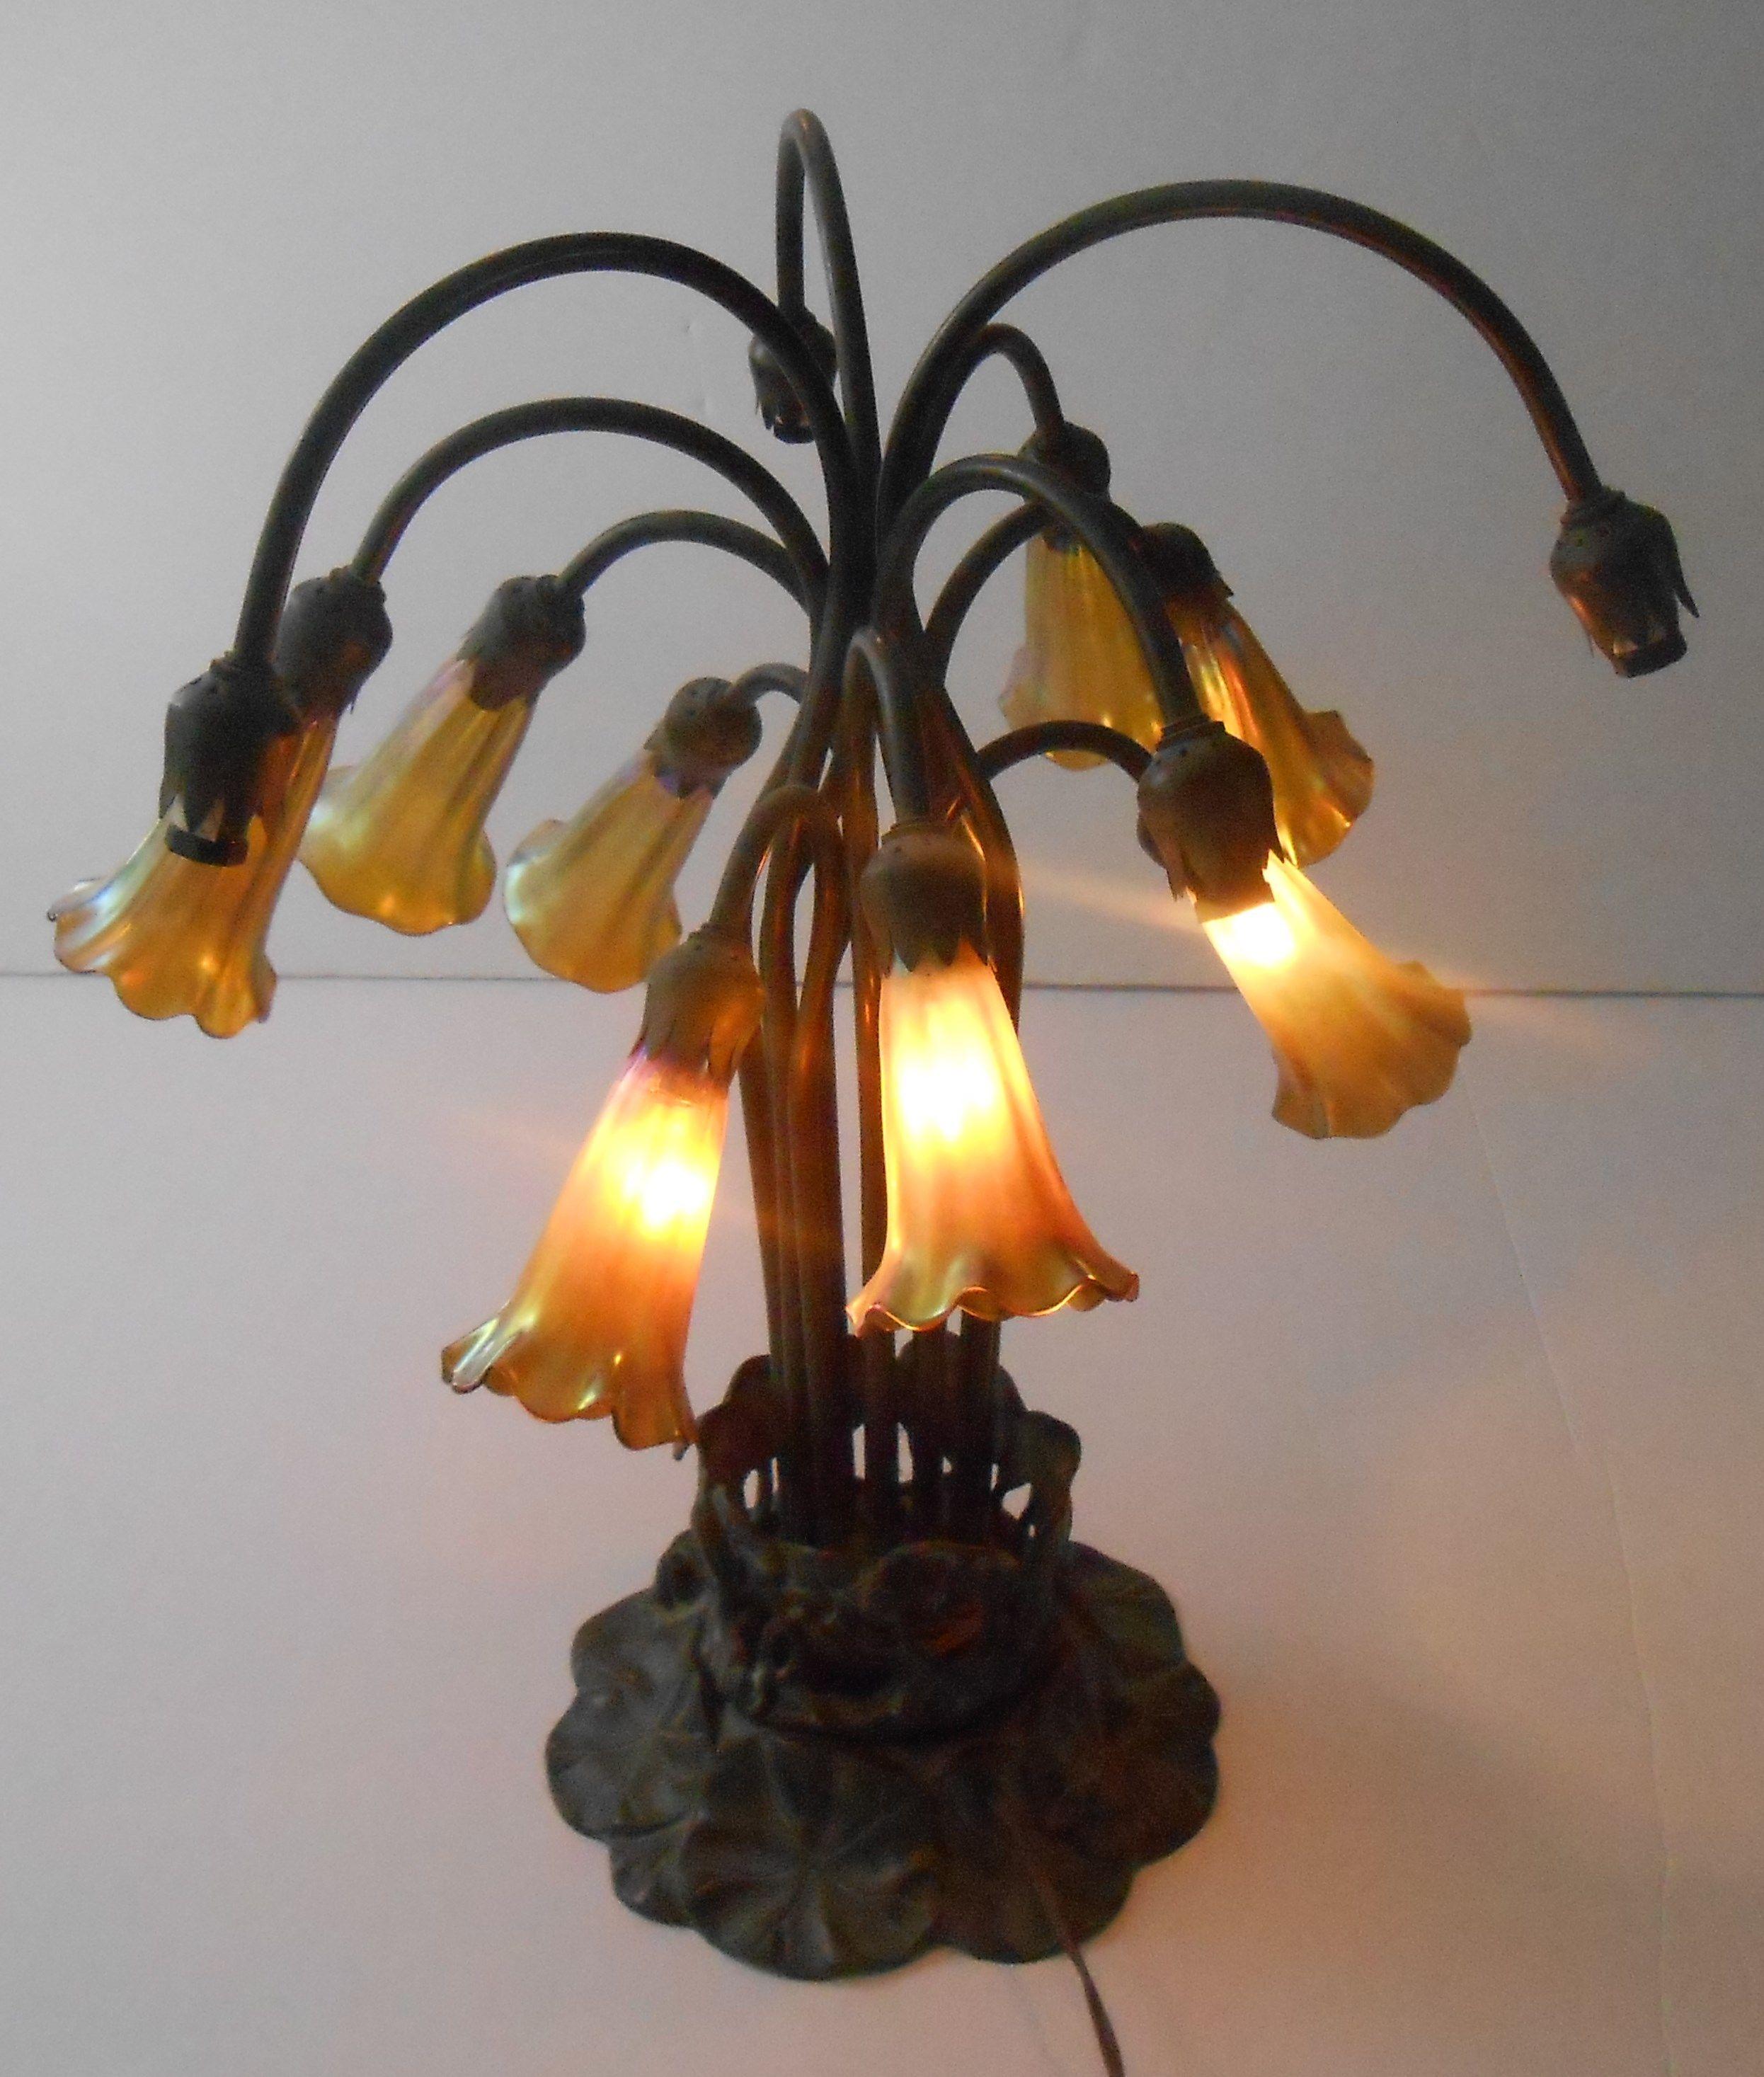 base floor dale art lamp metal z with lt tiffany table l peak jewels victorian chandelier draped glass